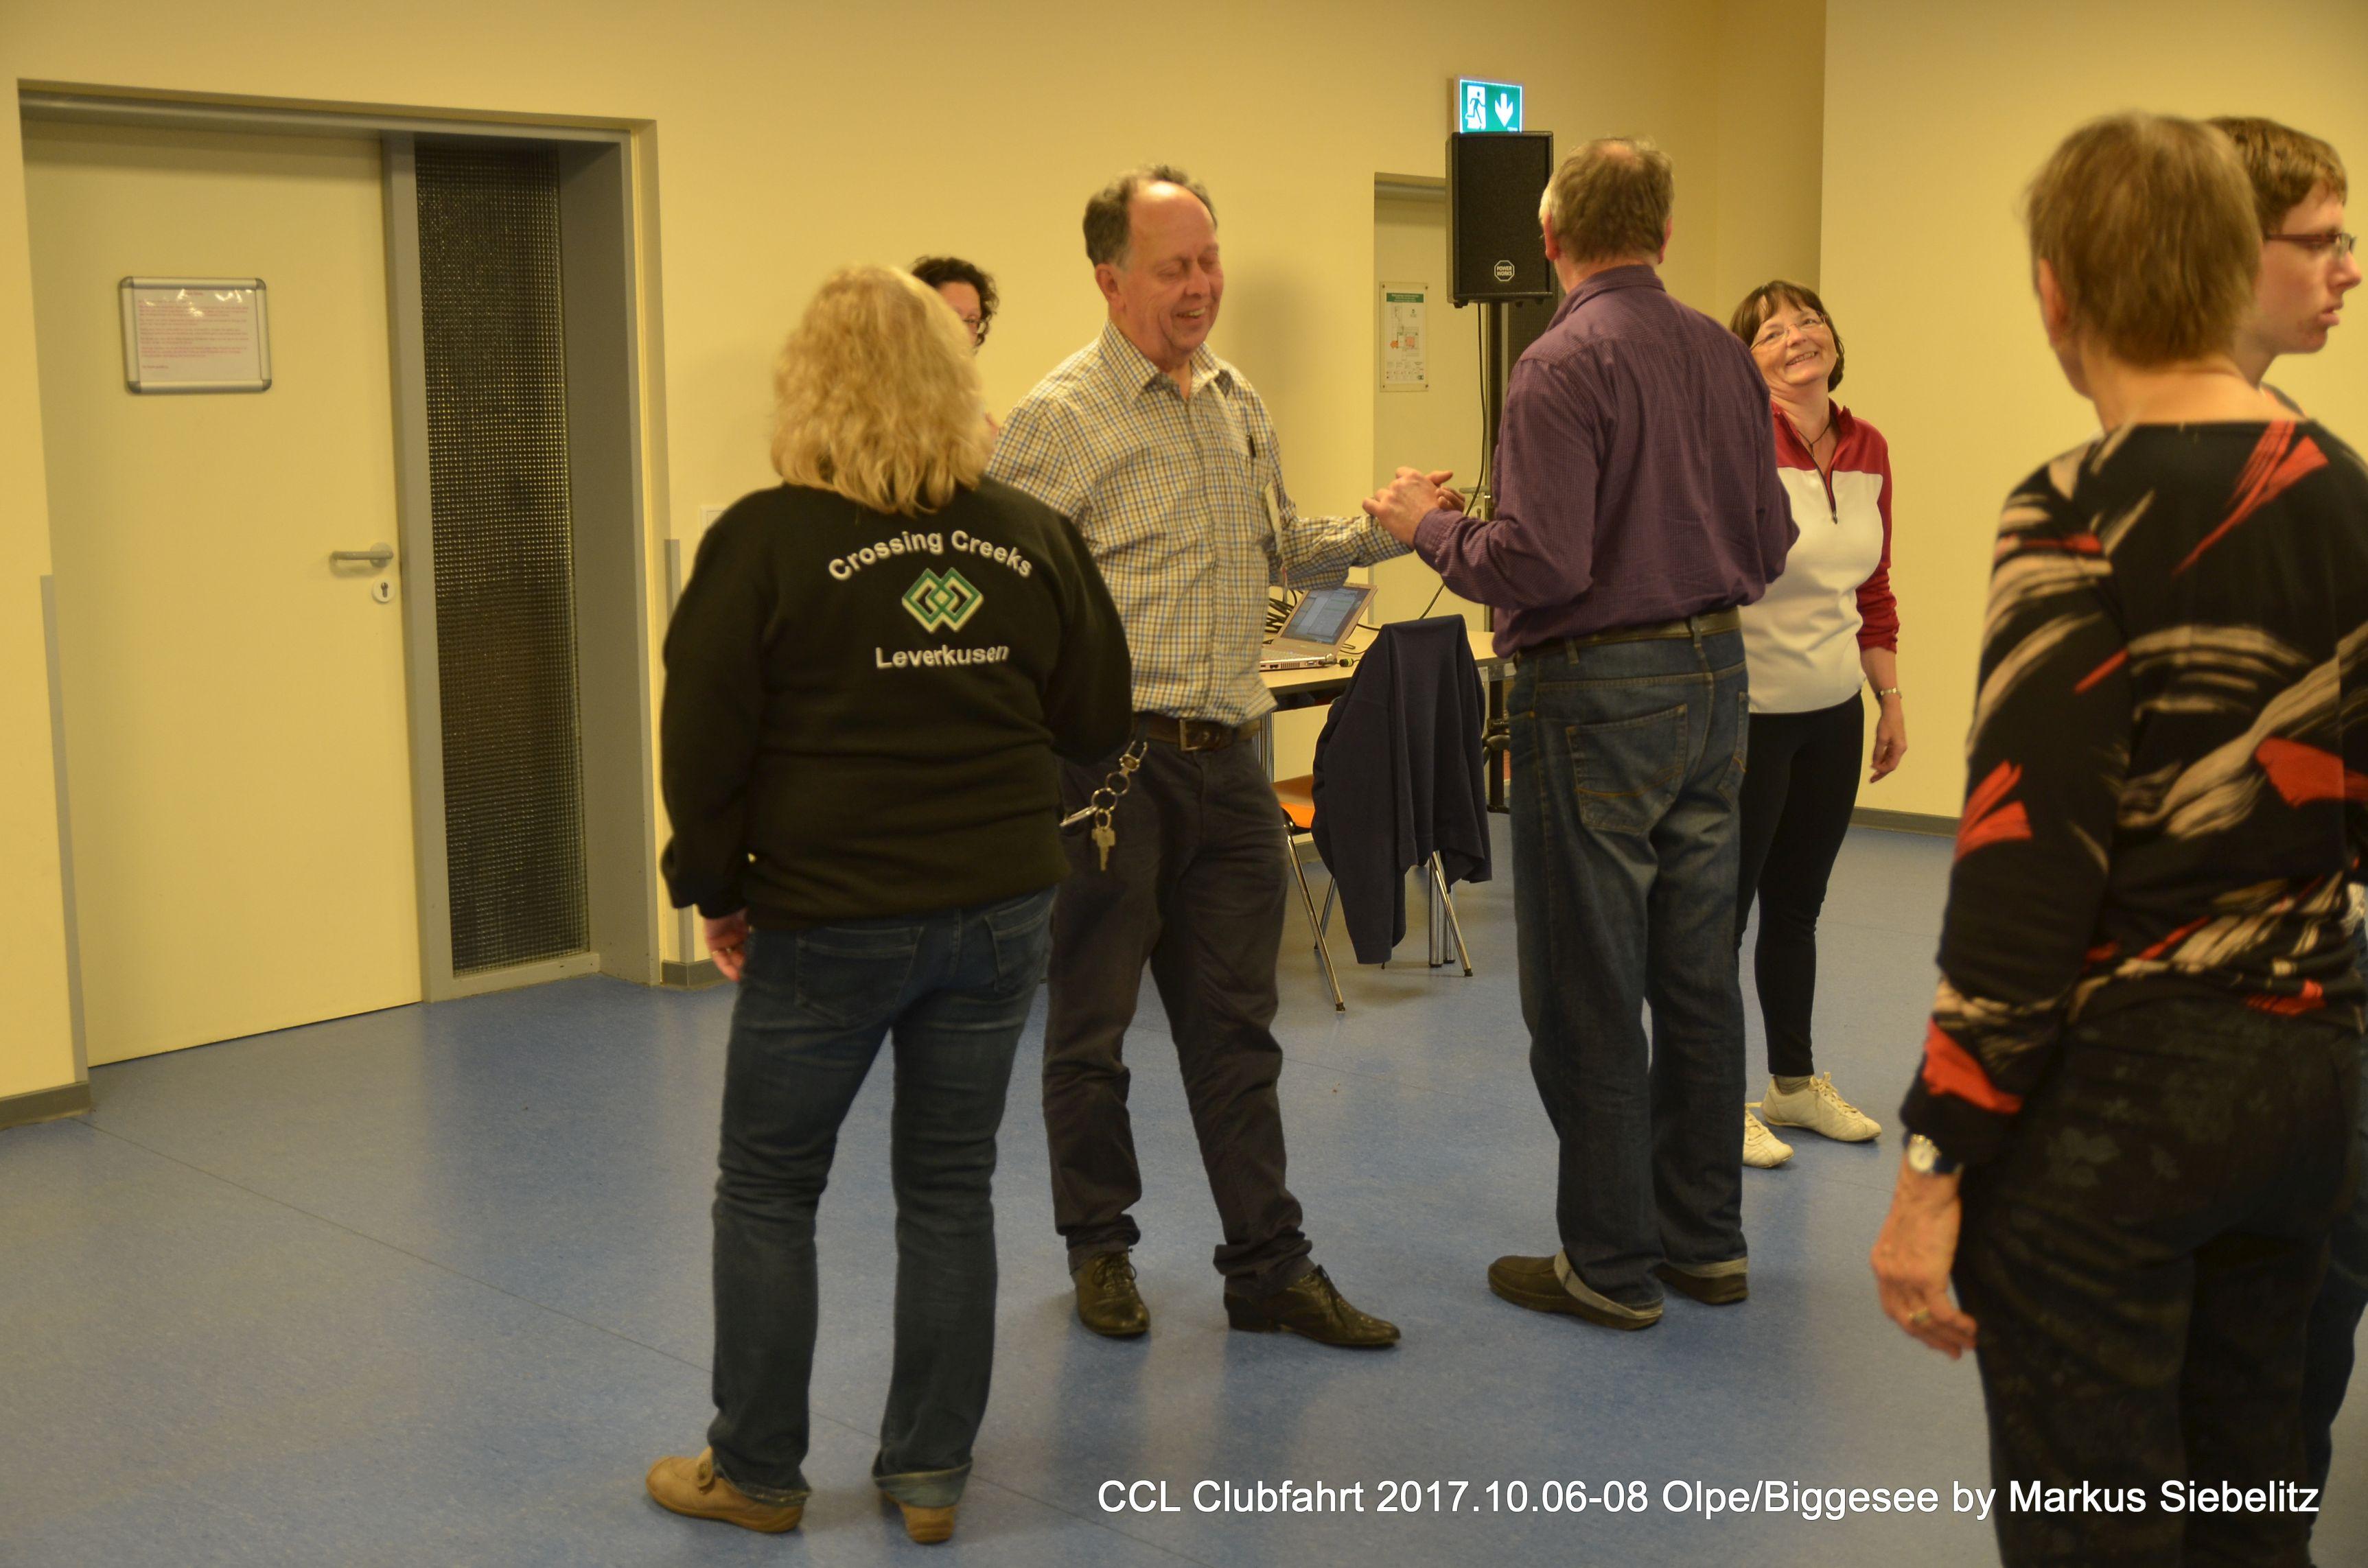 CCL Clubfahrt 2017.10.06-08 Biggesee (13)